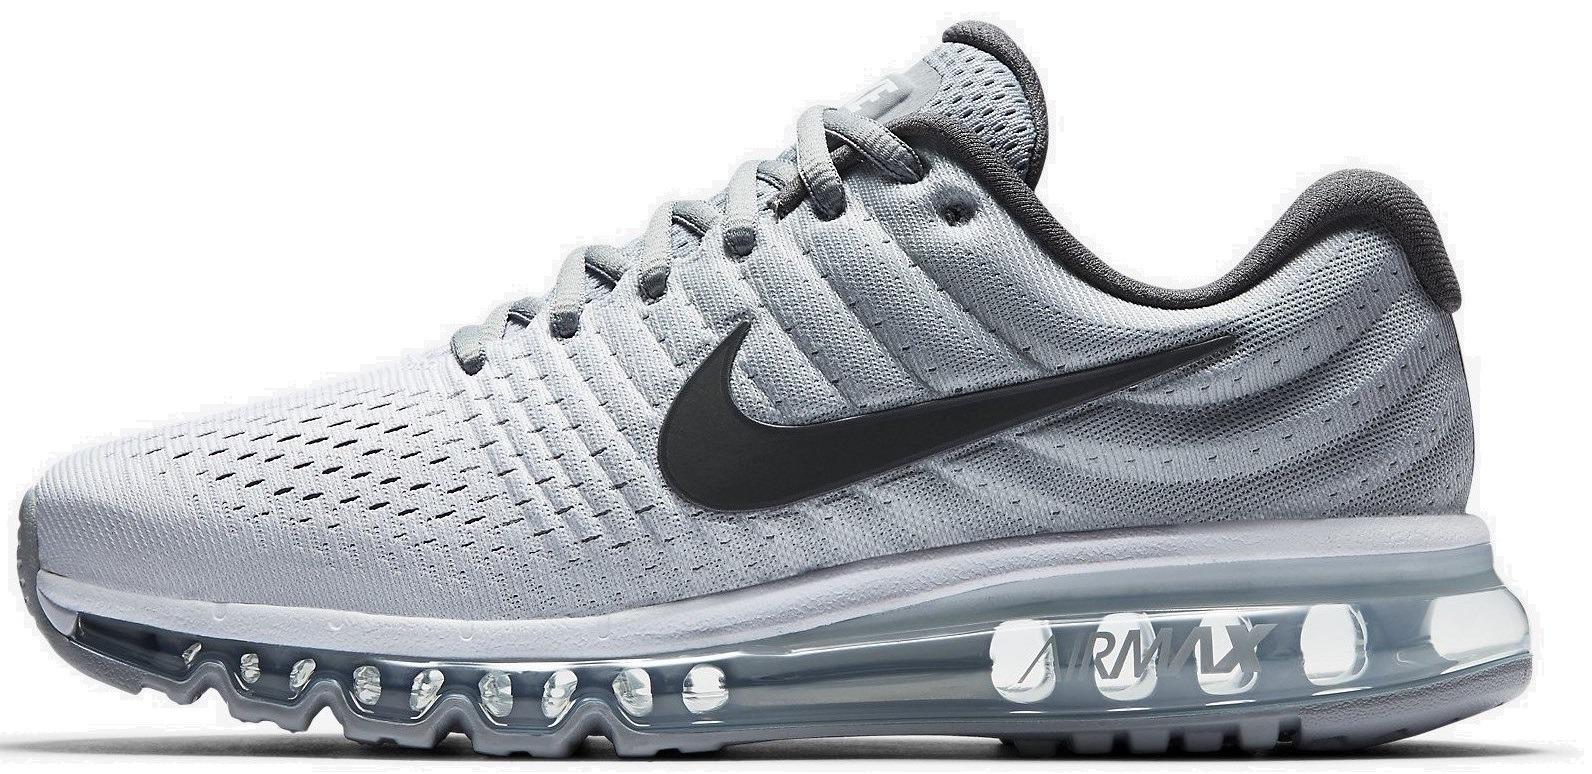 Купити чоловічі спортивні кросівки Nike Air Max 2017 - brooklynstore.com.ua f93cec7a3aaef